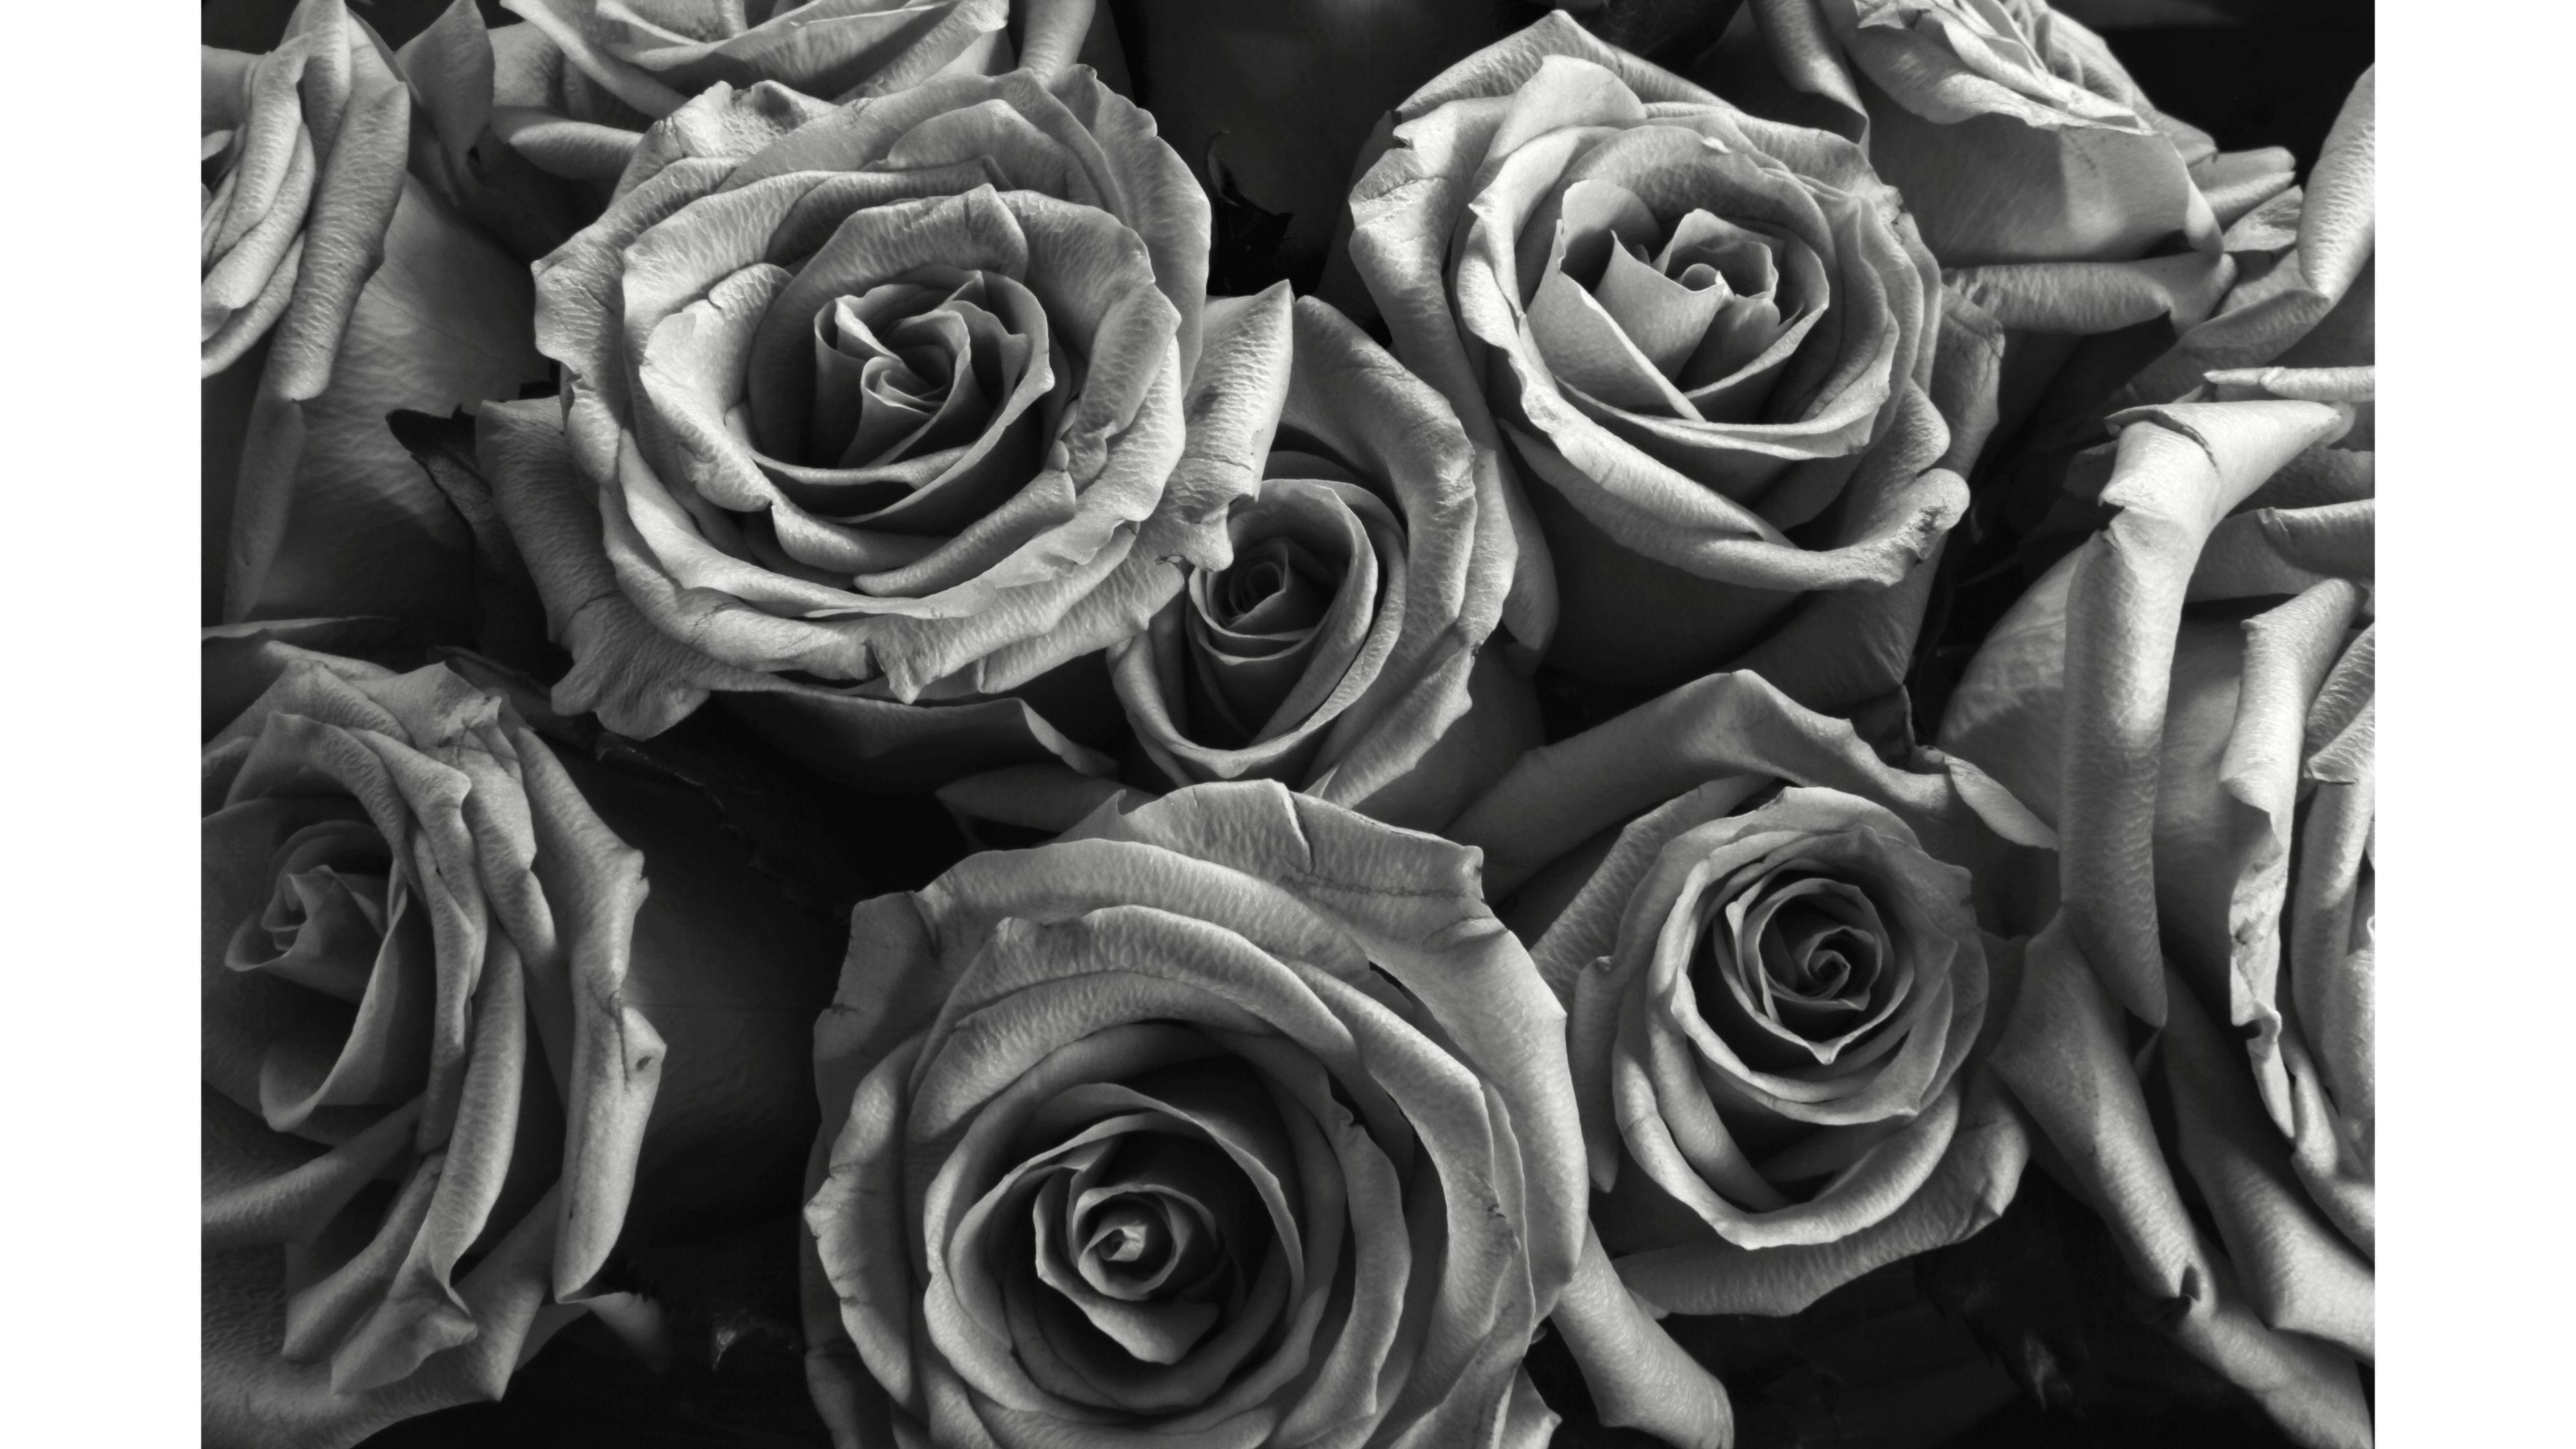 Silver Rose Wallpaper